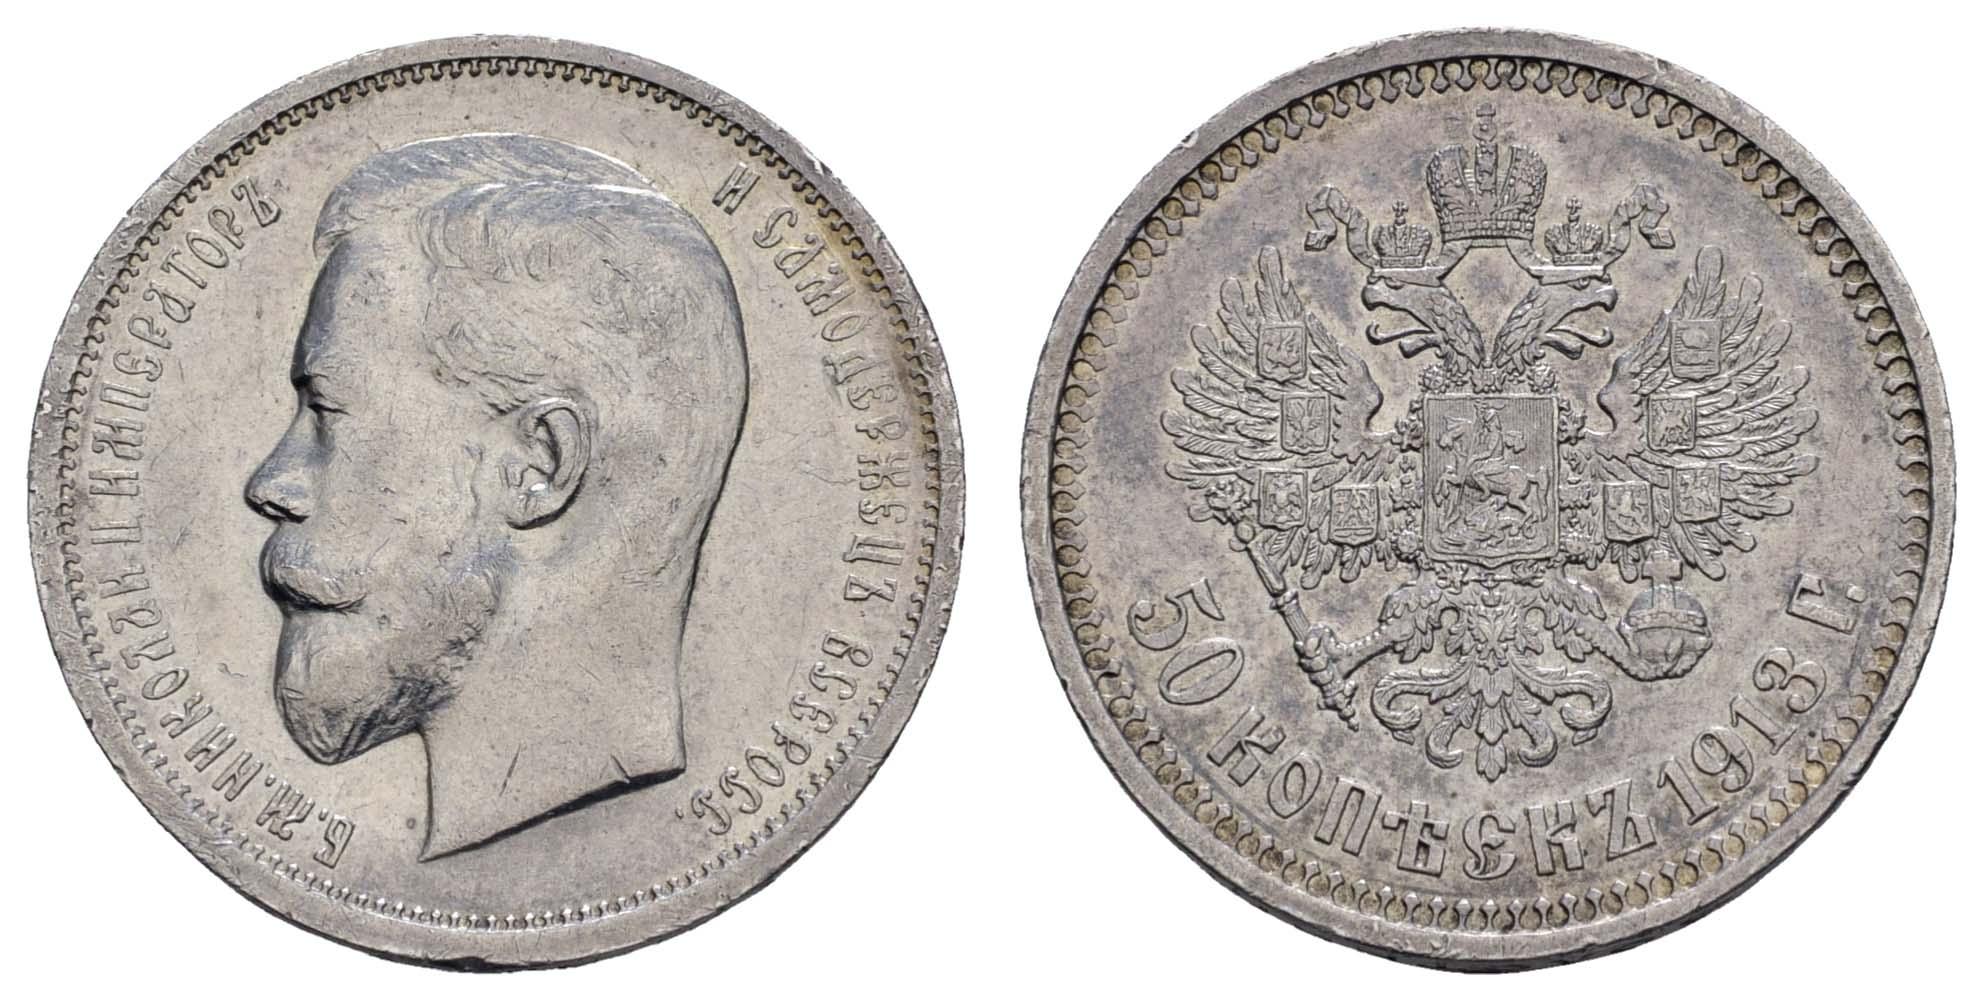 Lot 1751 - europa ab 1800 - Russland -  Auktionshaus Ulrich Felzmann GmbH & Co. KG Coins single lots